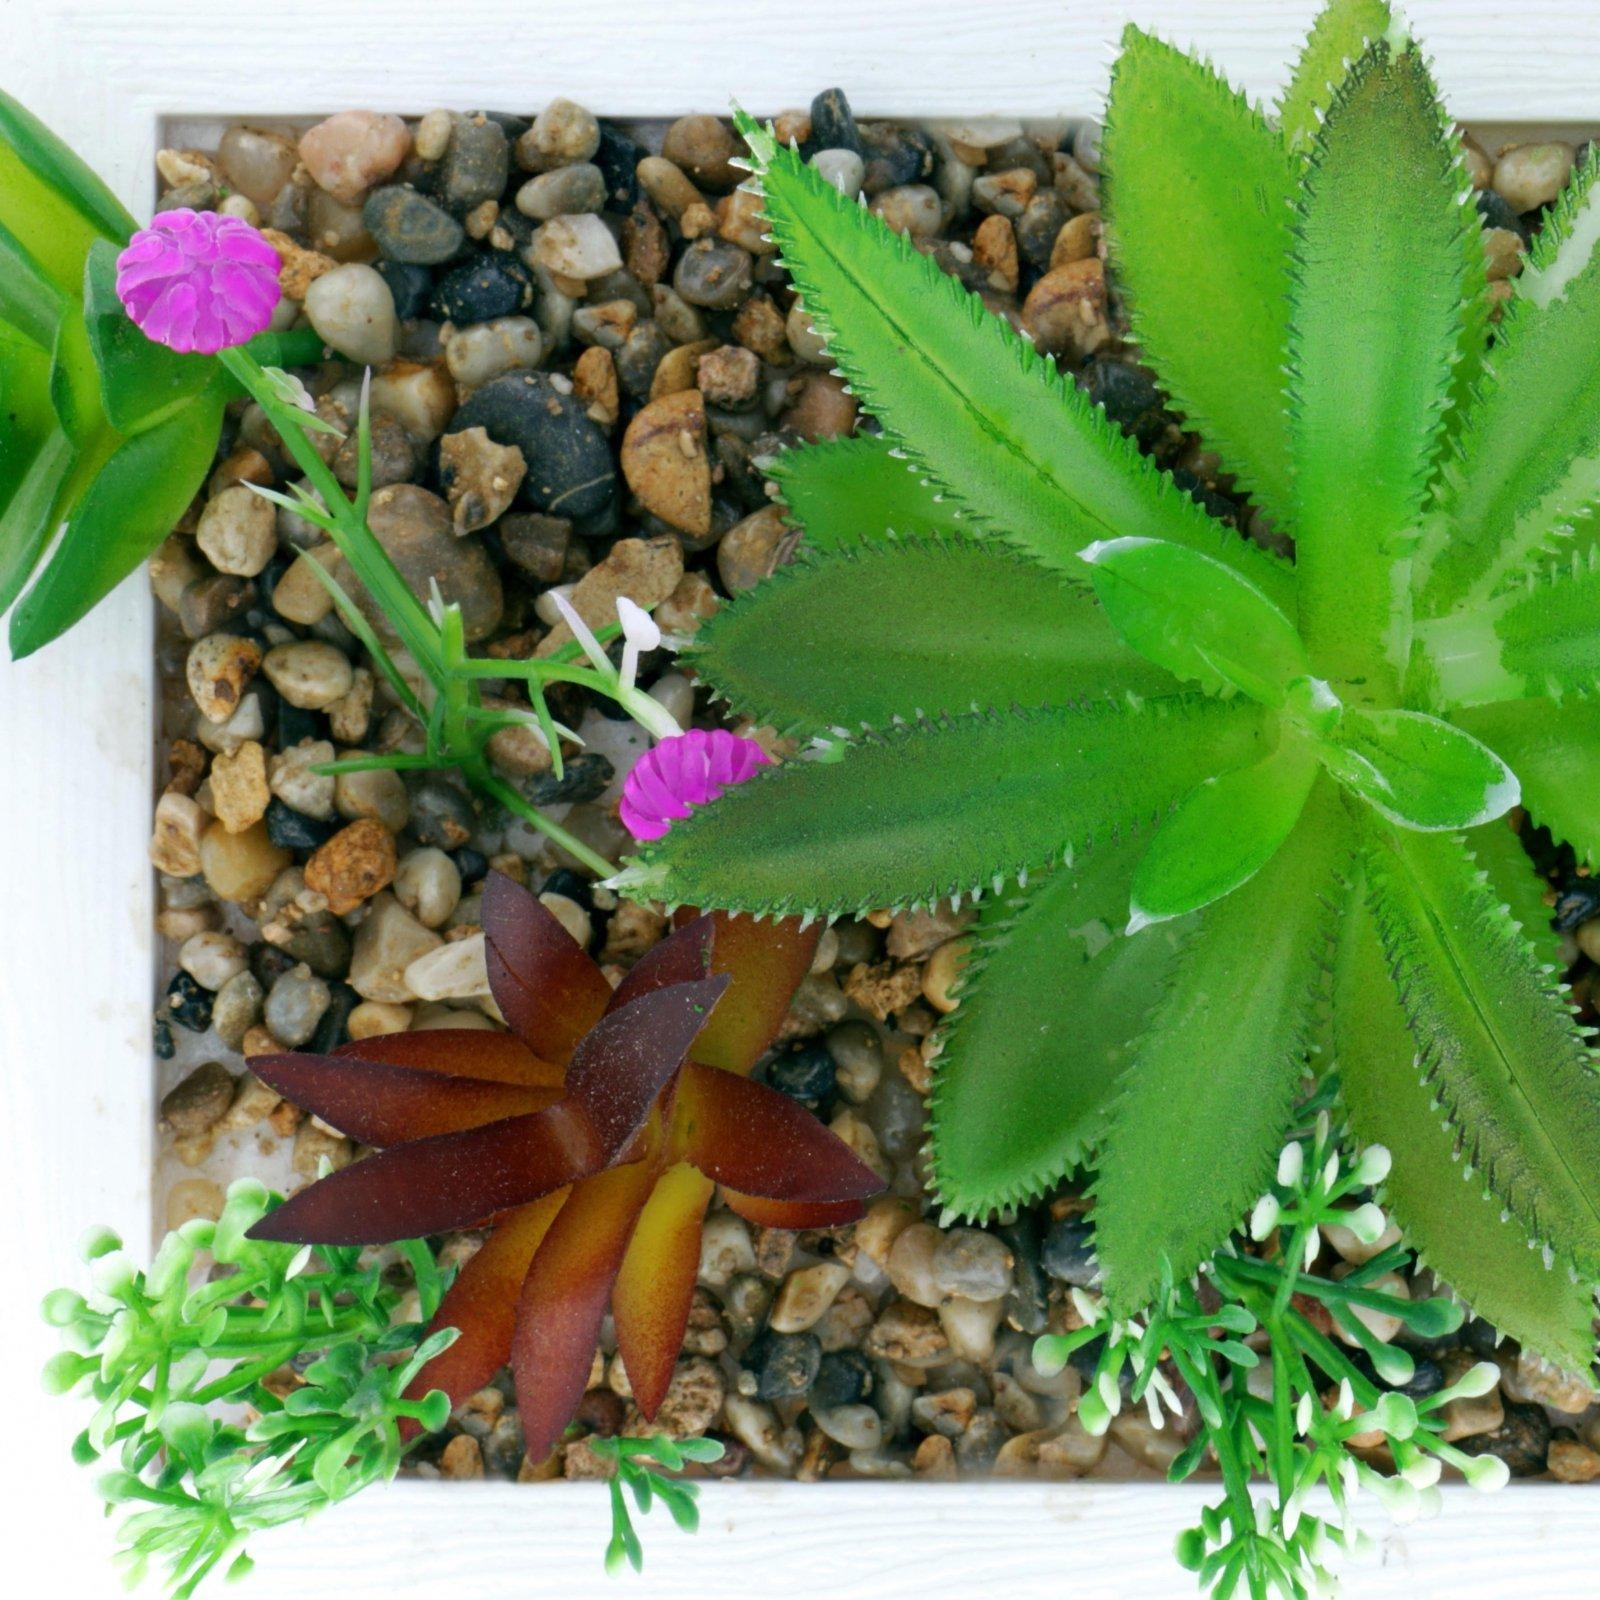 Home Essentials Decor Artificial Plant Succulent Garden In Planter - White